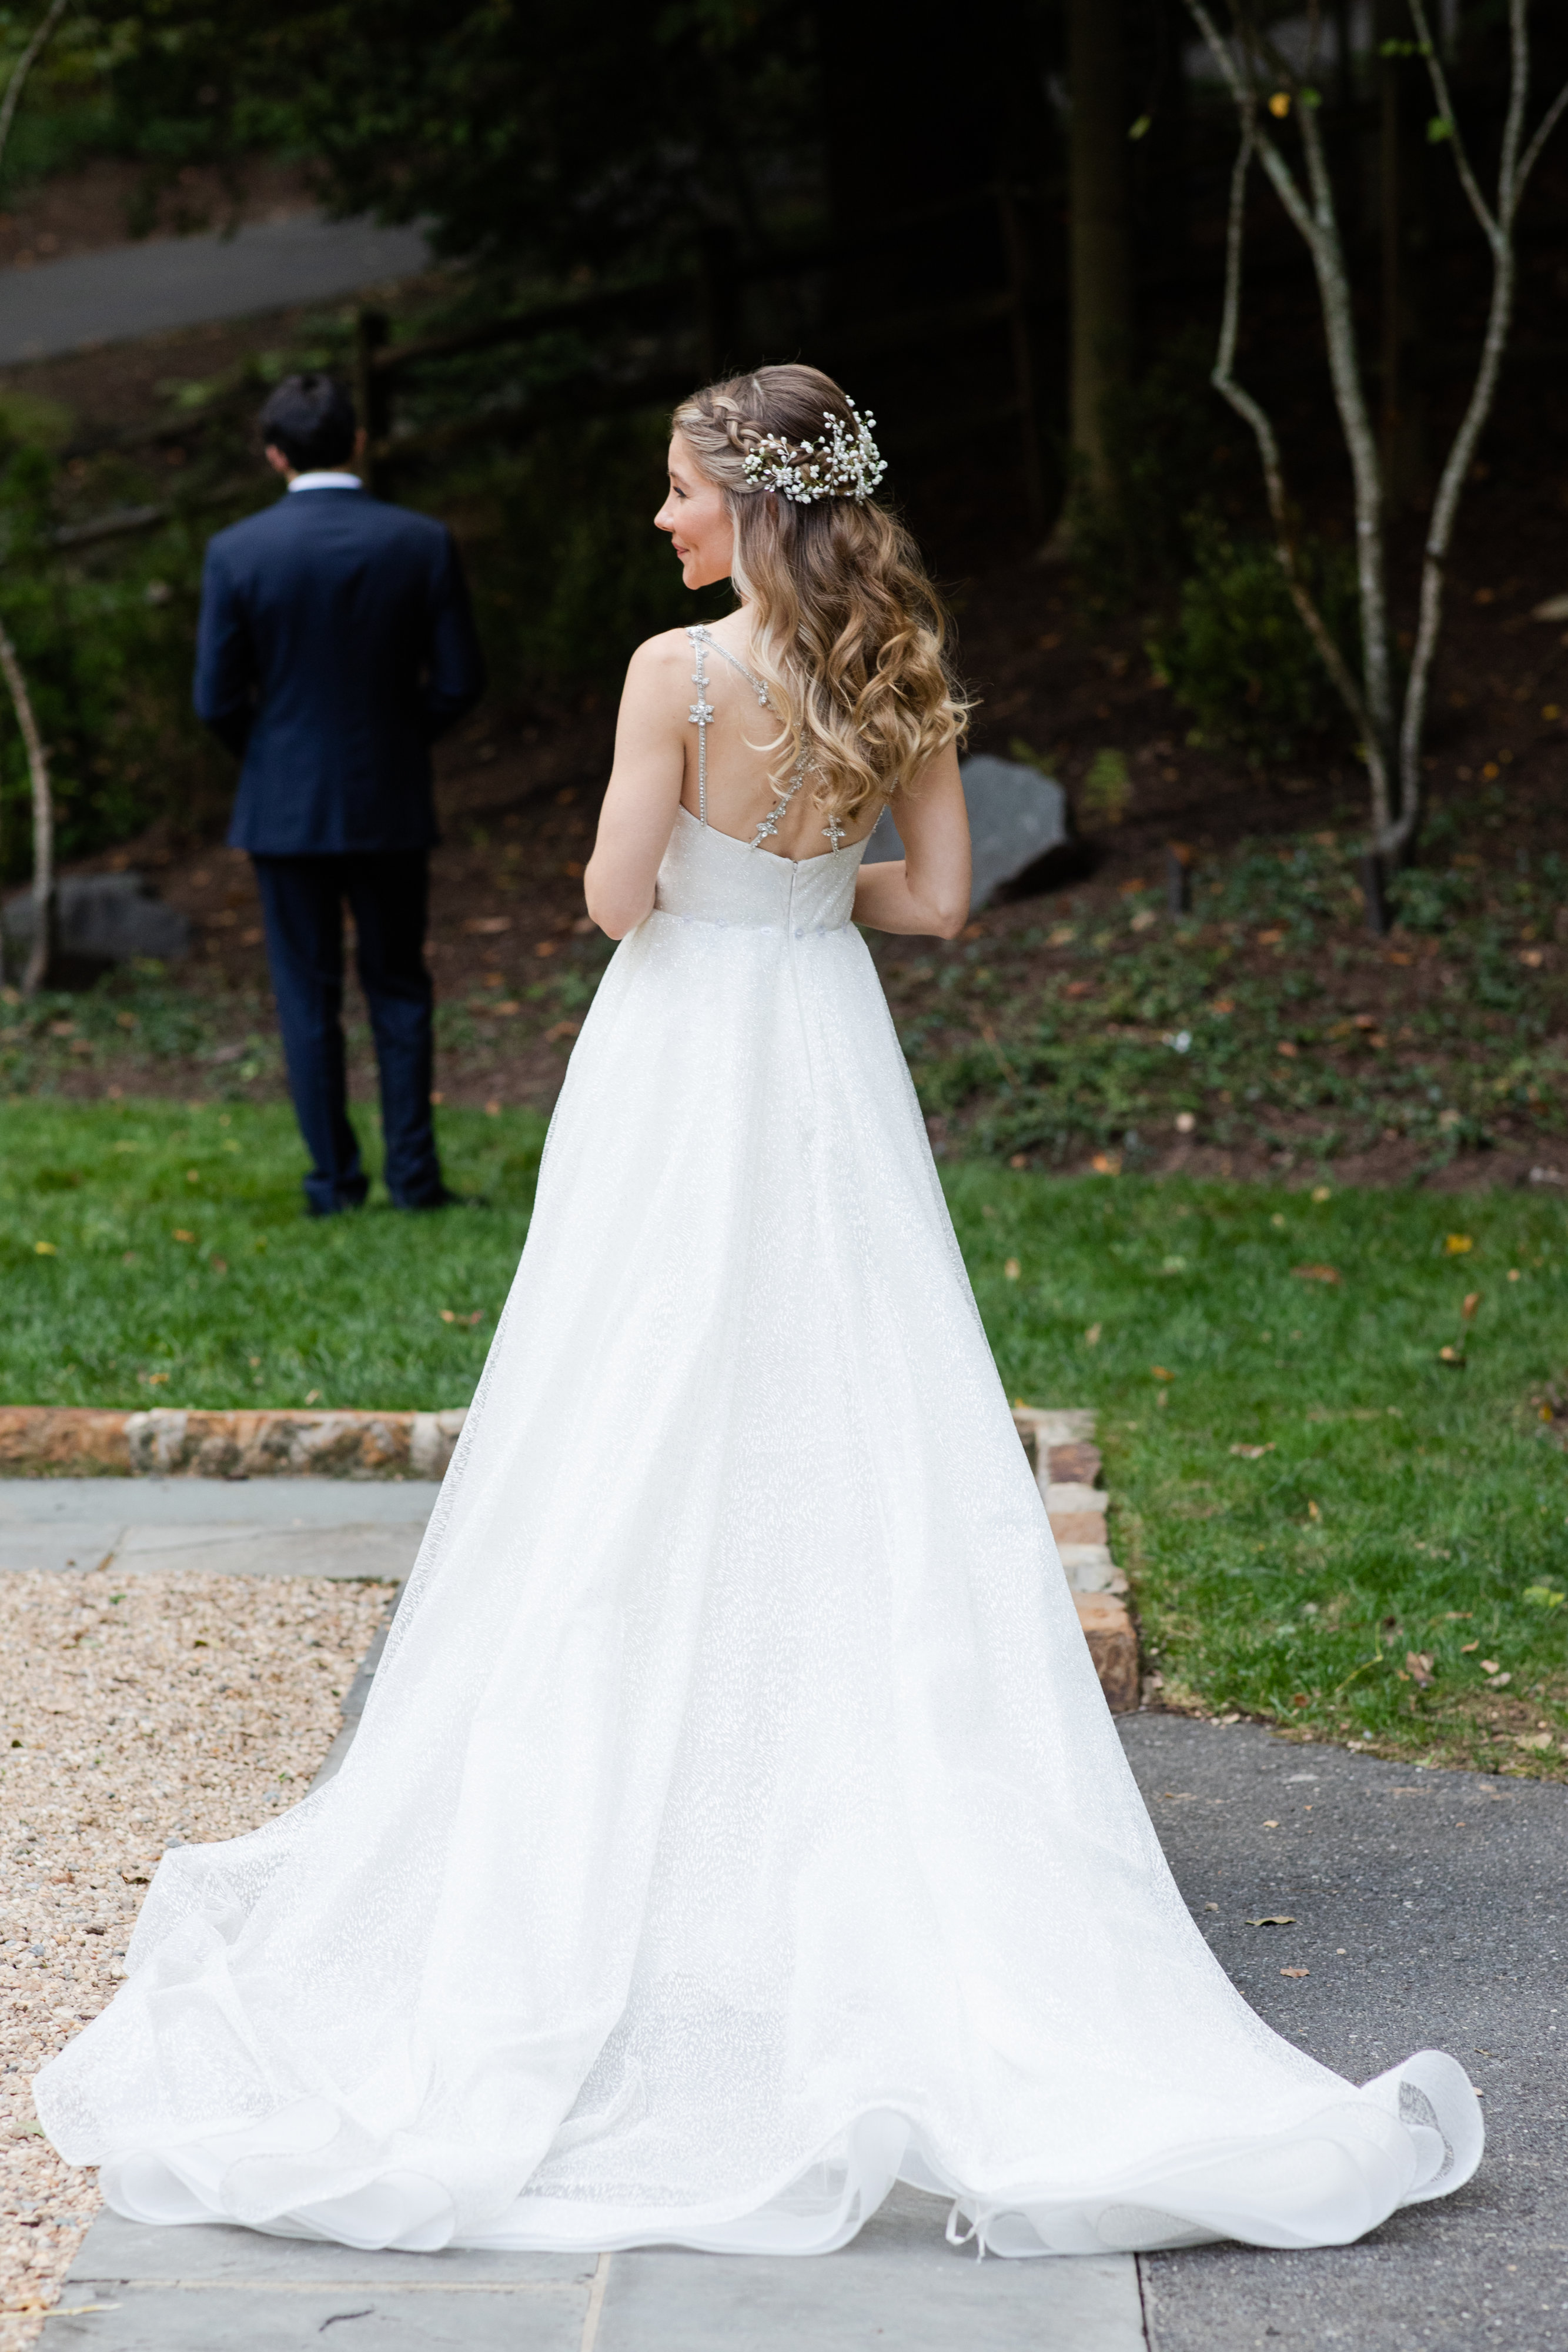 StefanieKamermanPhotography-MelanieandBenjamin-Wedding-Bethesda,MD-2019-10-12-102